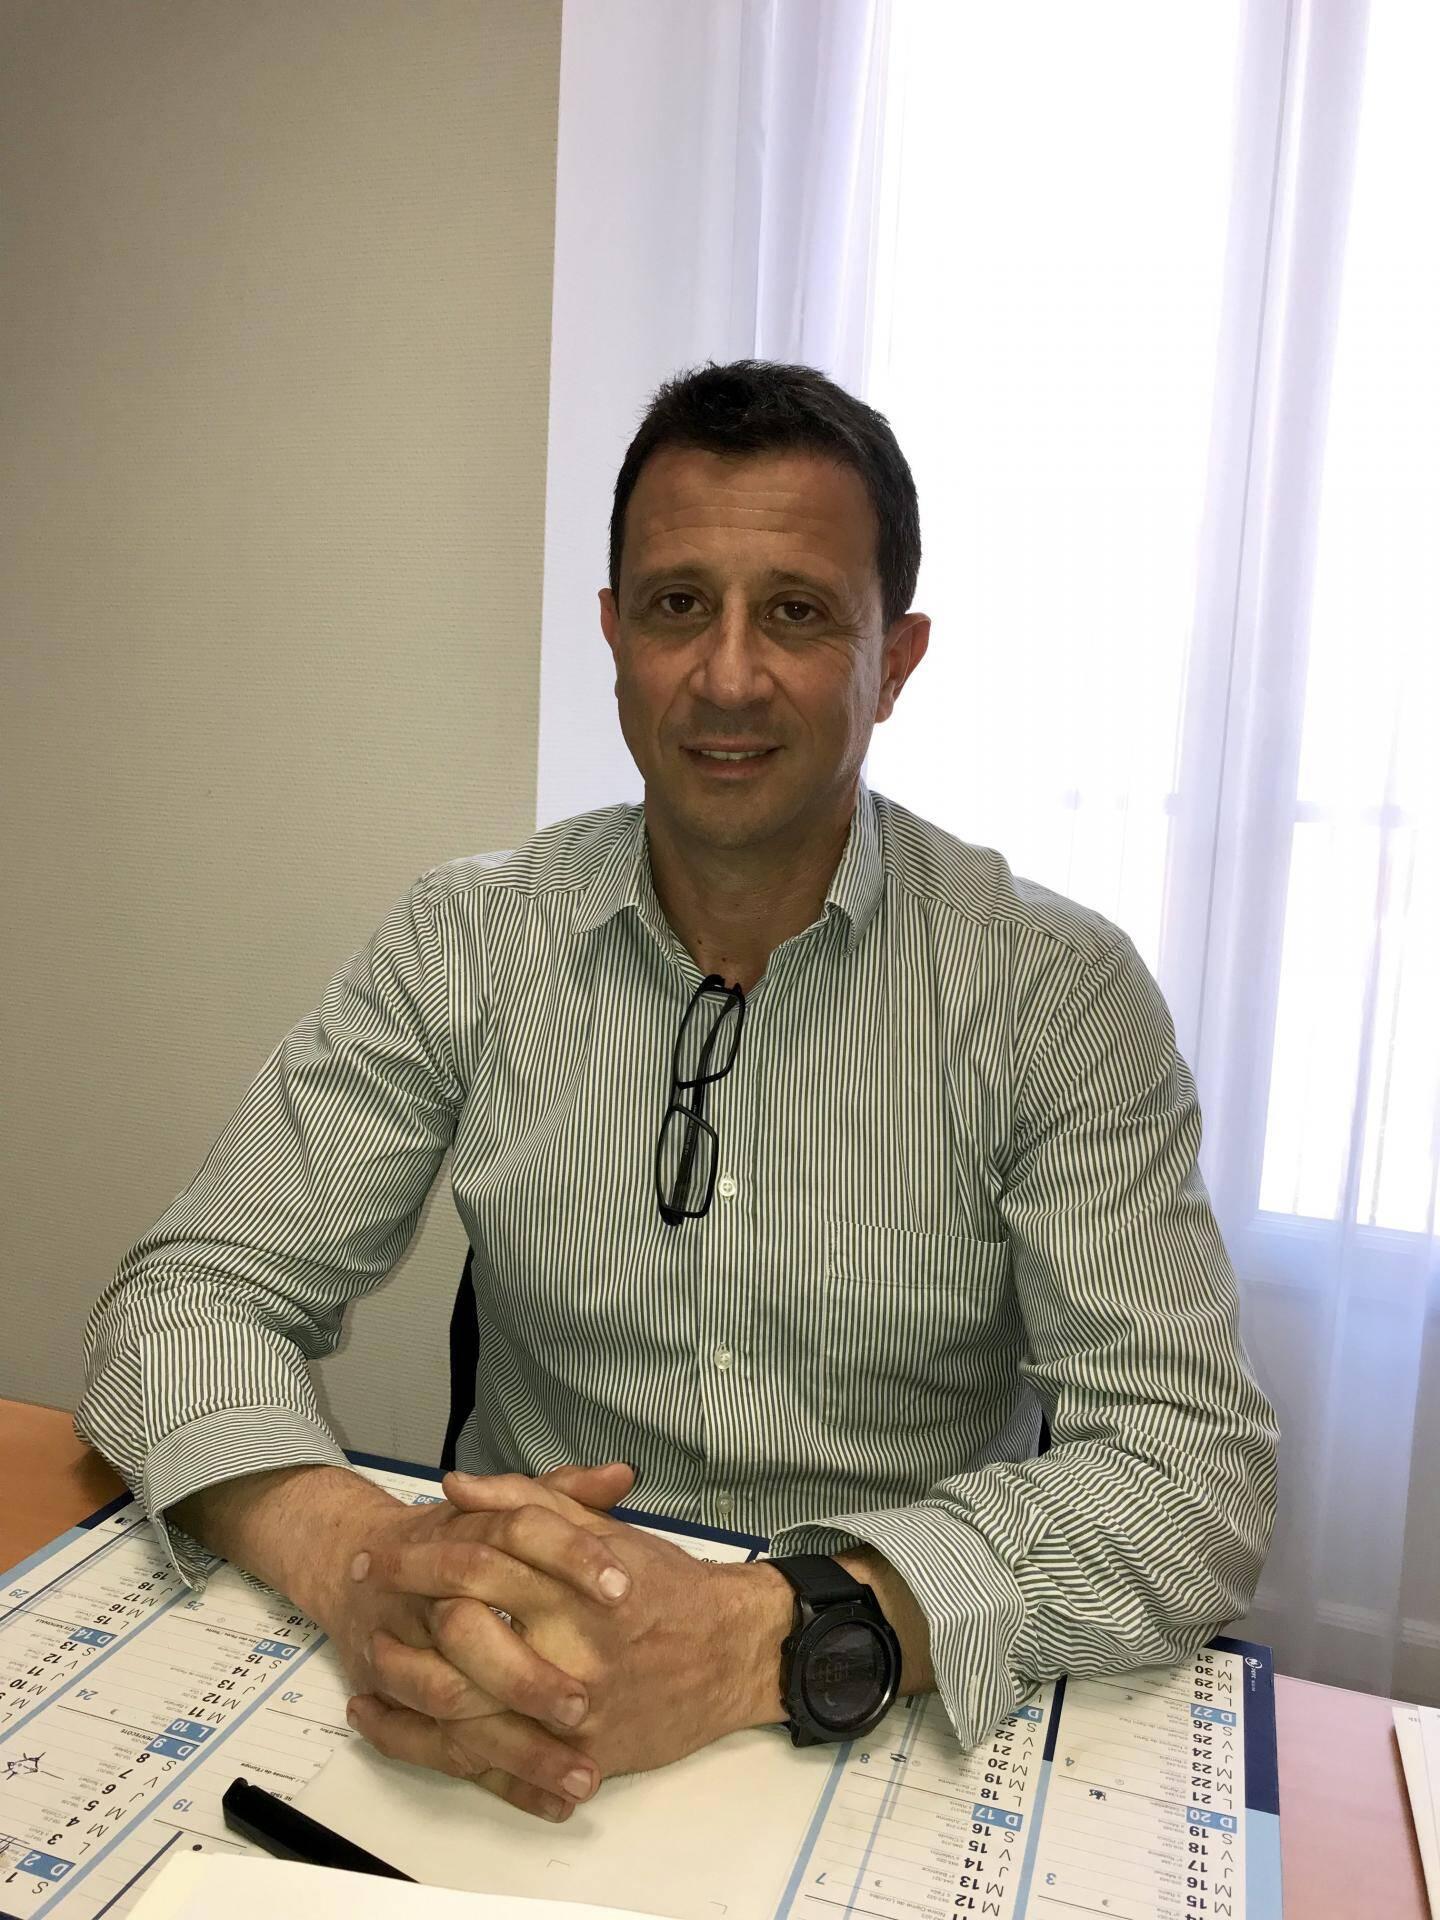 Faredj Cherikh, chef du service addictologie au CHU de Nice